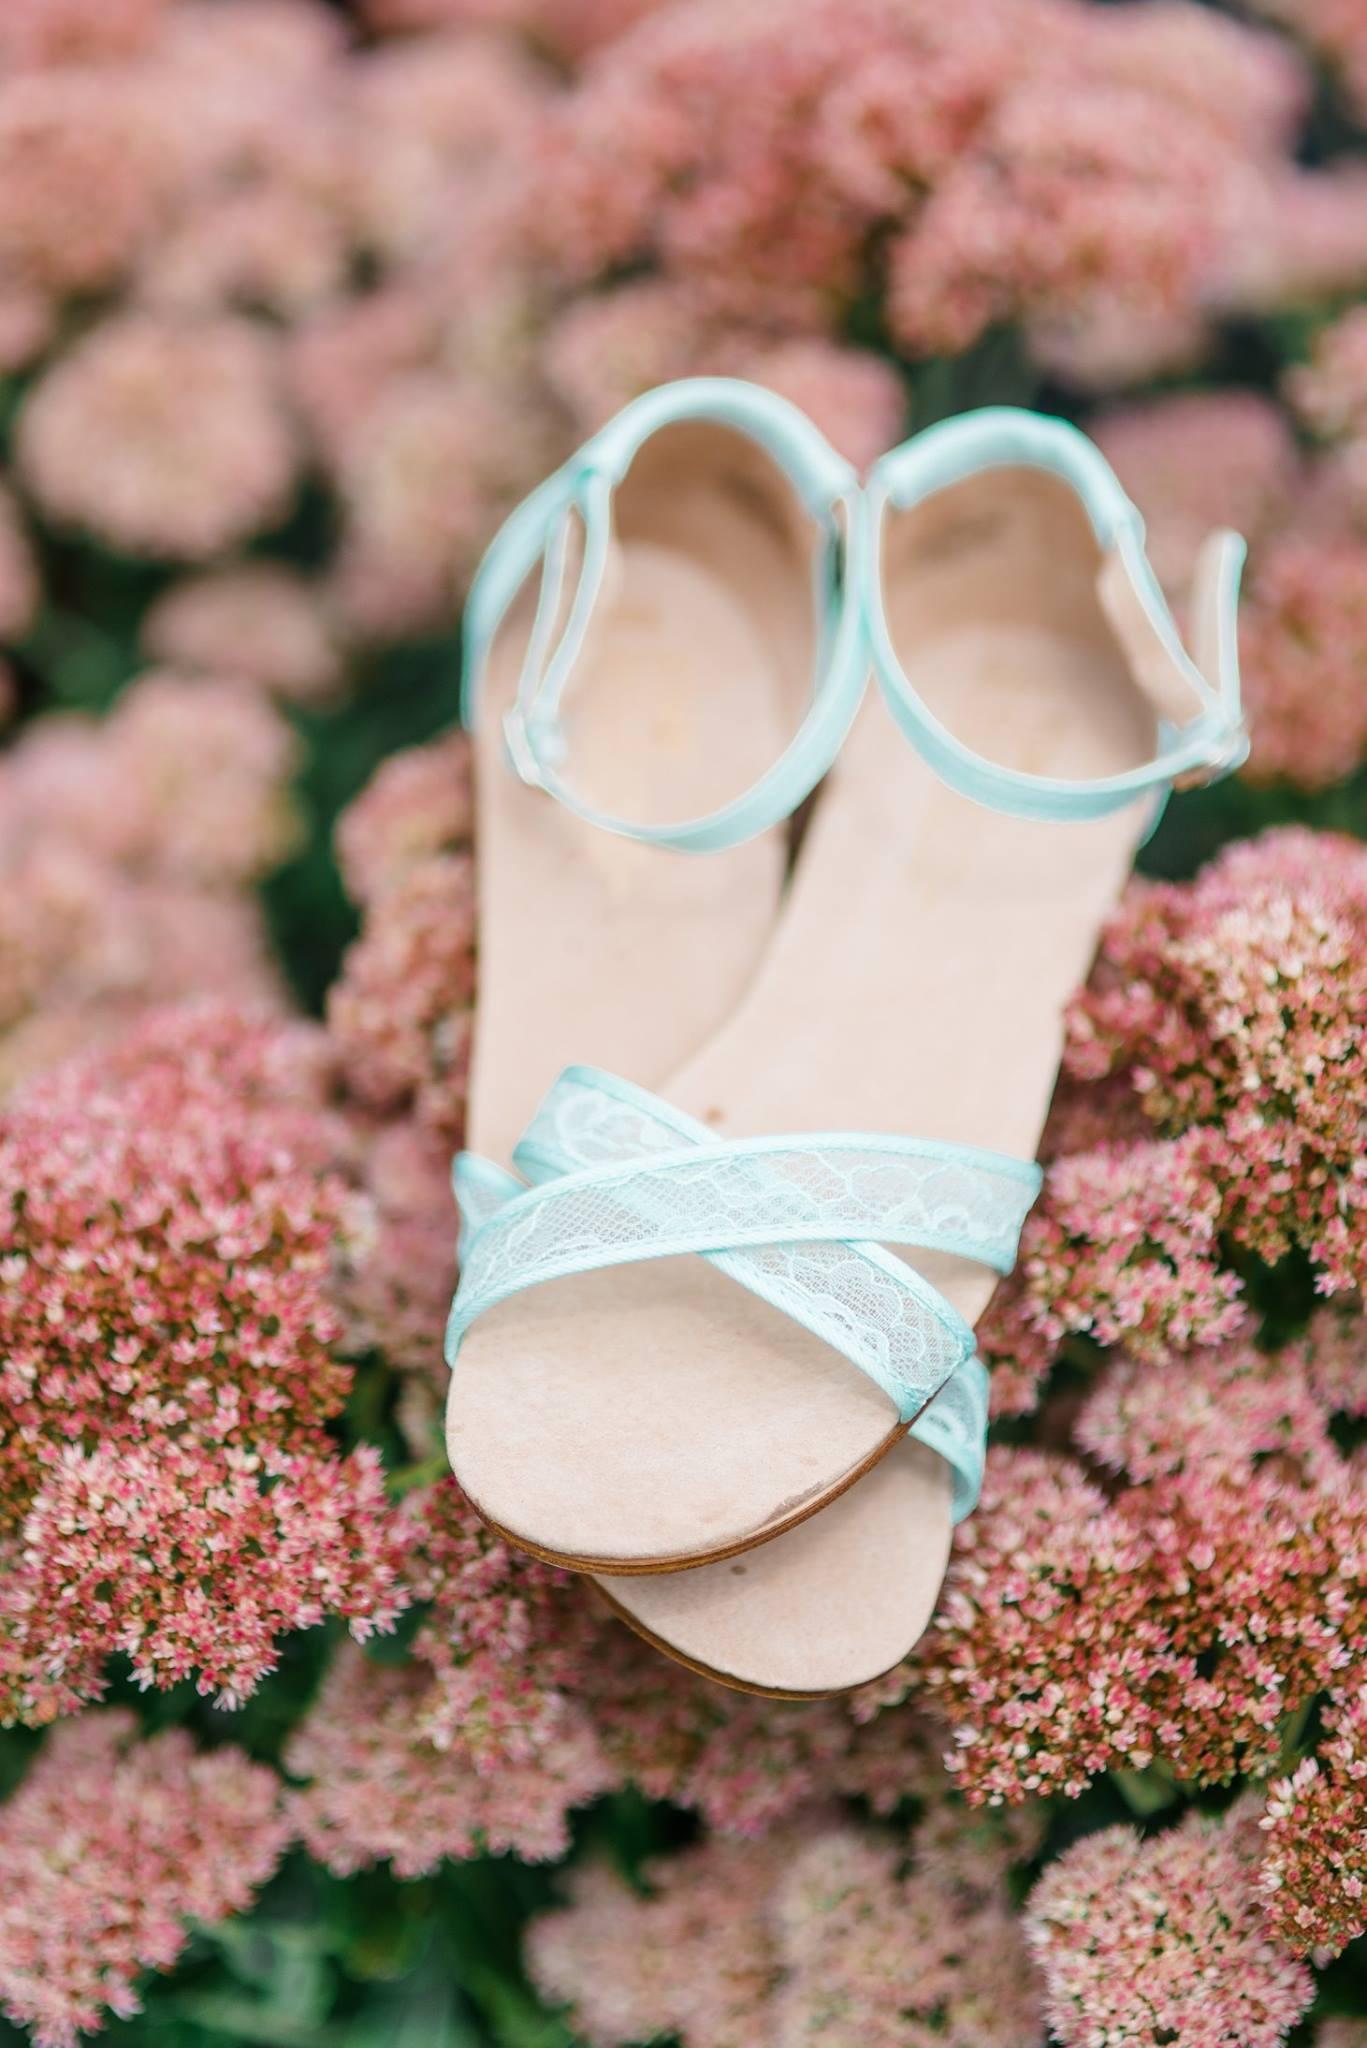 pennsylvania-backyard-wedding-love-diy-bohemian-romantic-colorful-0005.jpg